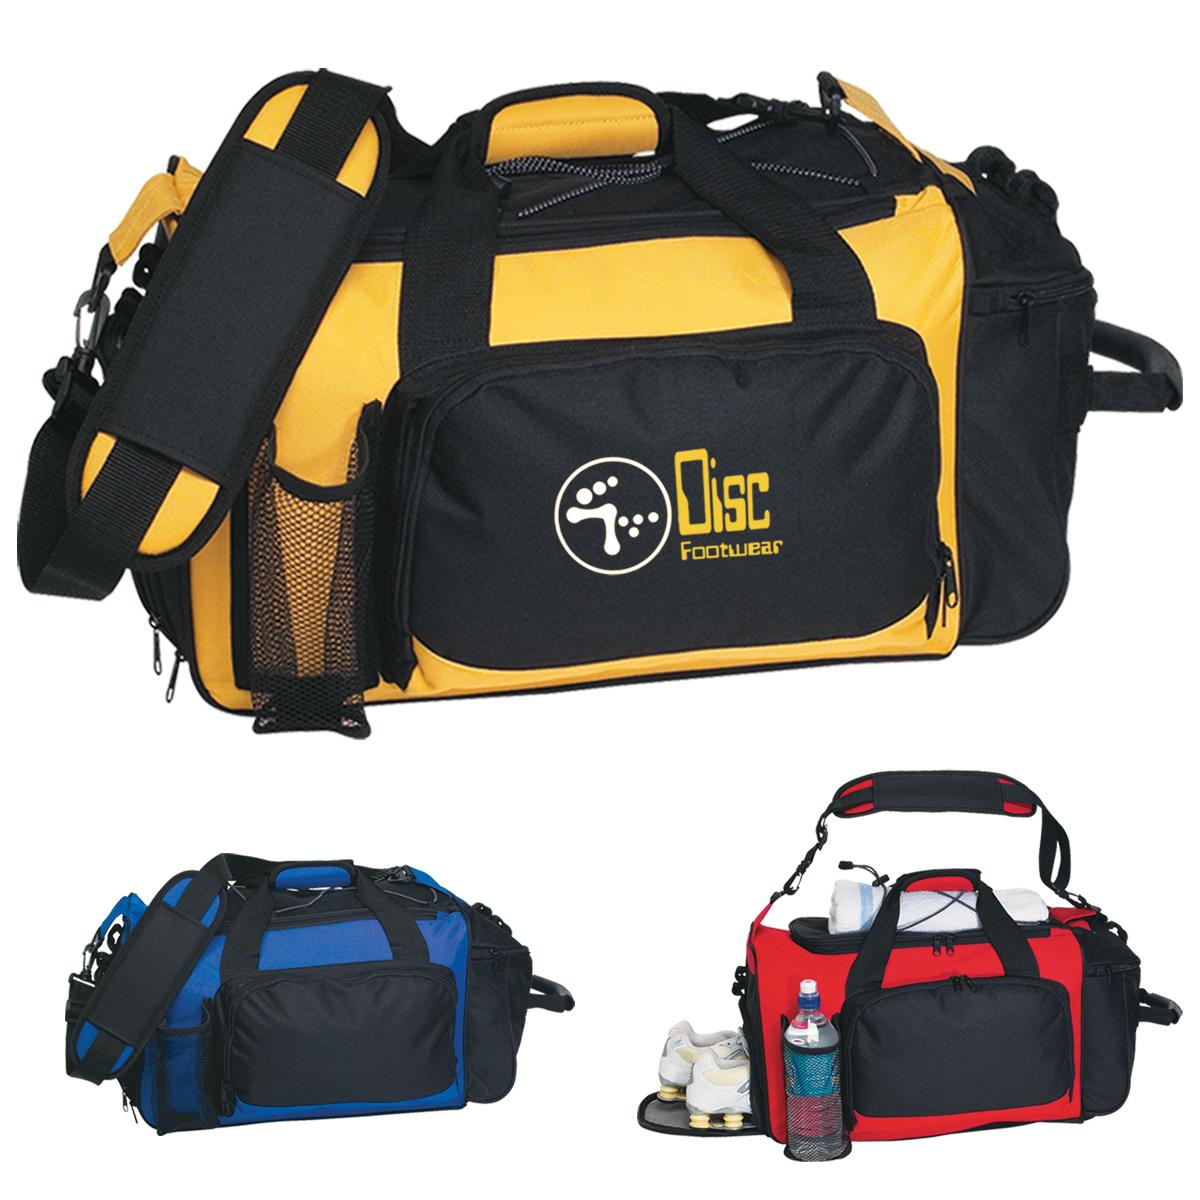 Bags, Duffels & Accessories